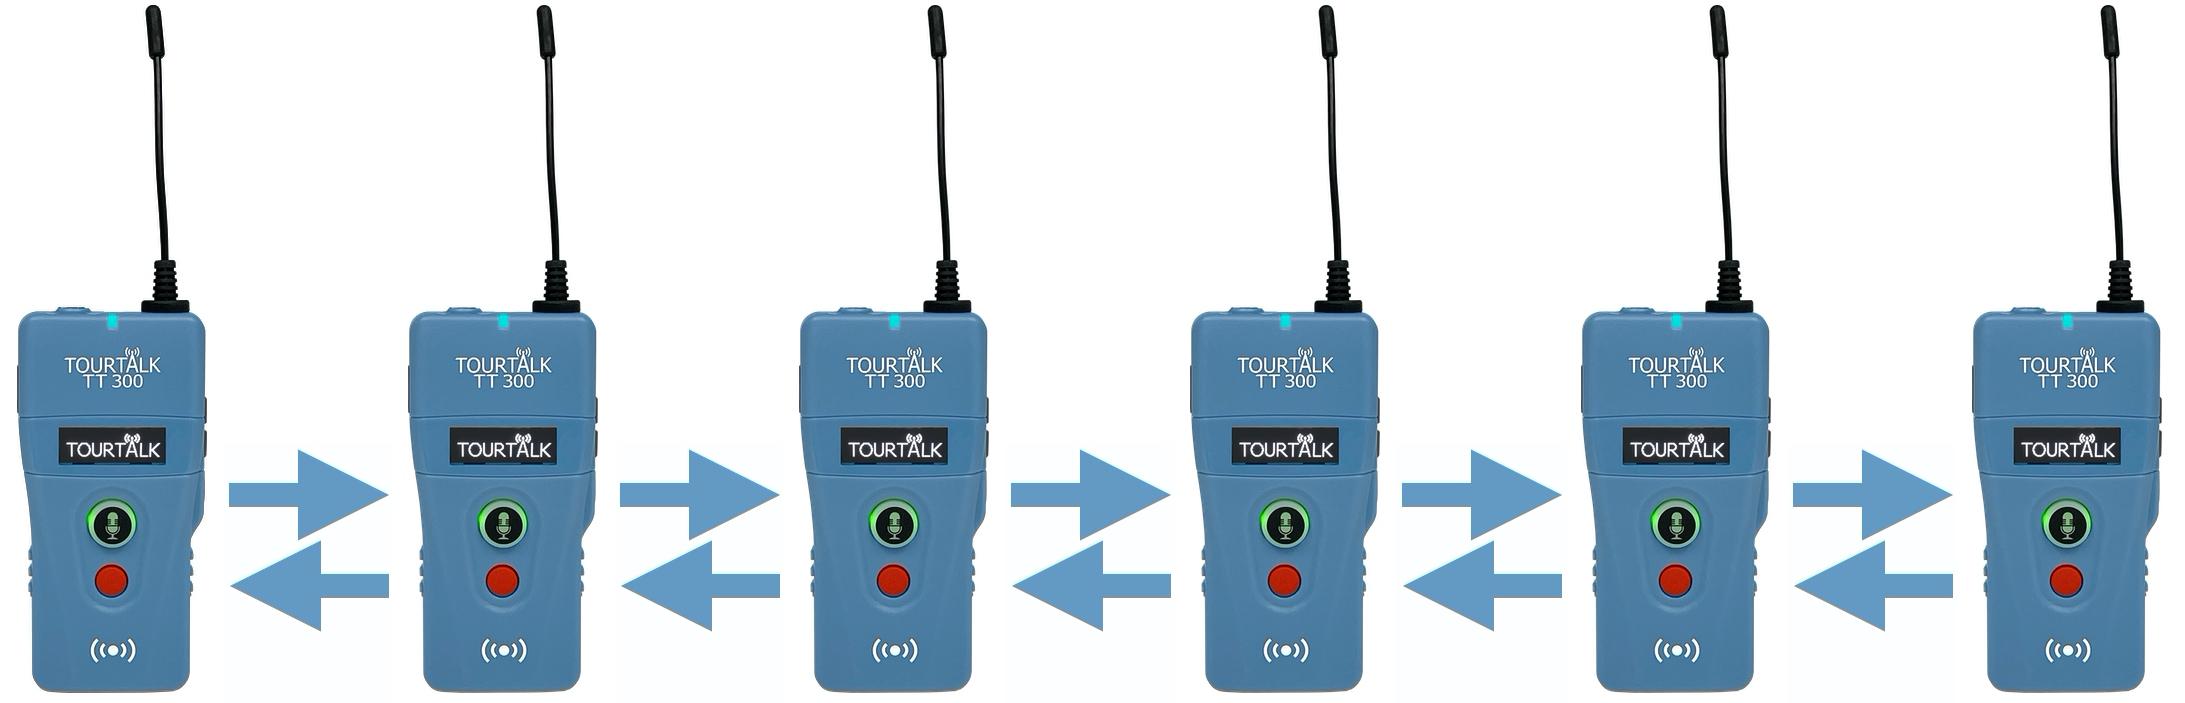 ourtalk TT 300 full-duplex communication system example